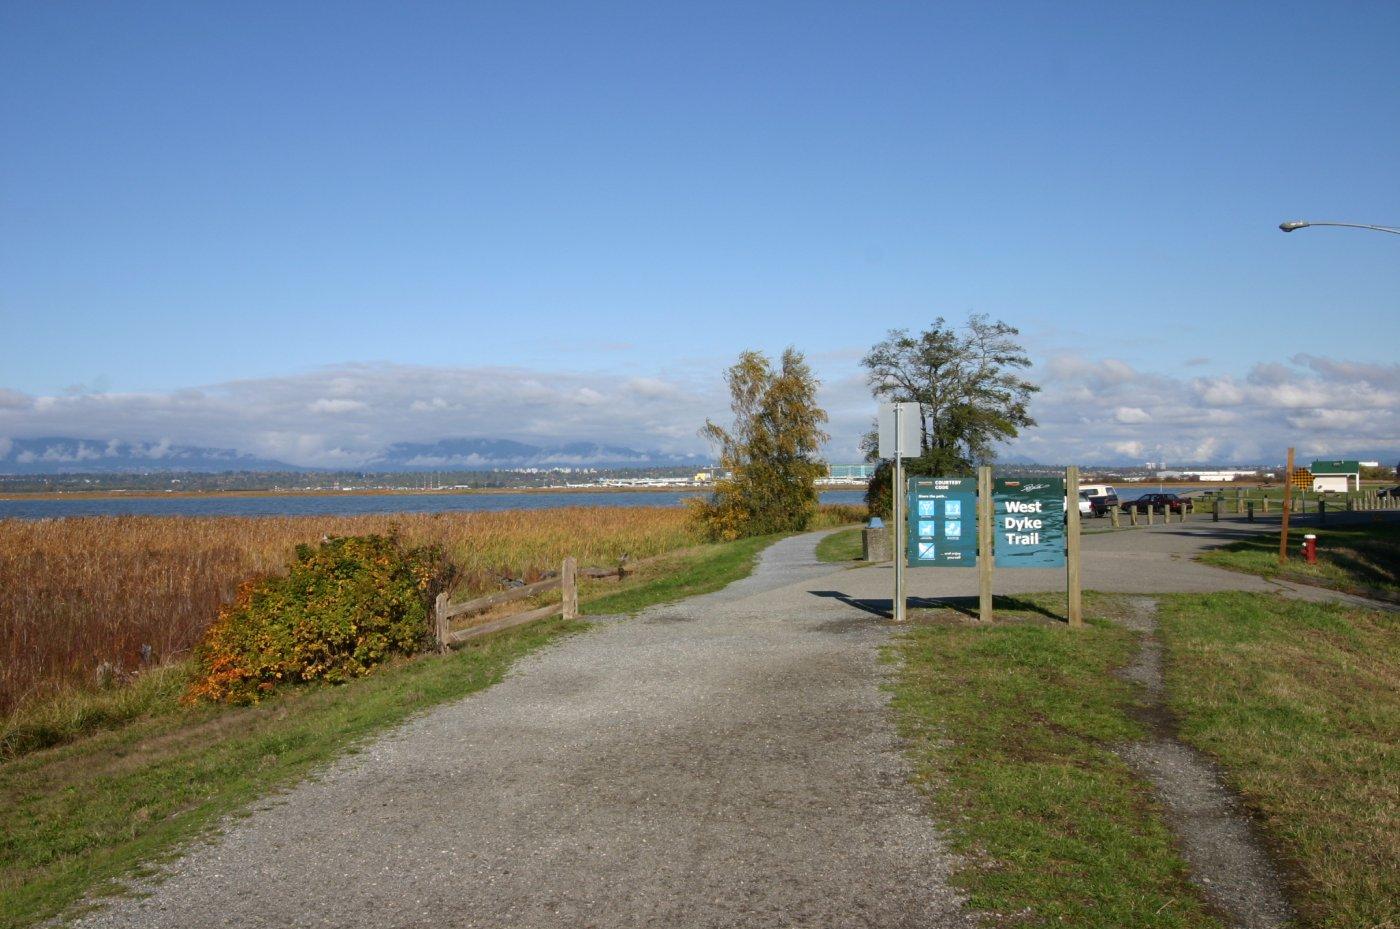 West Dyke Trail | Terra Nova Park